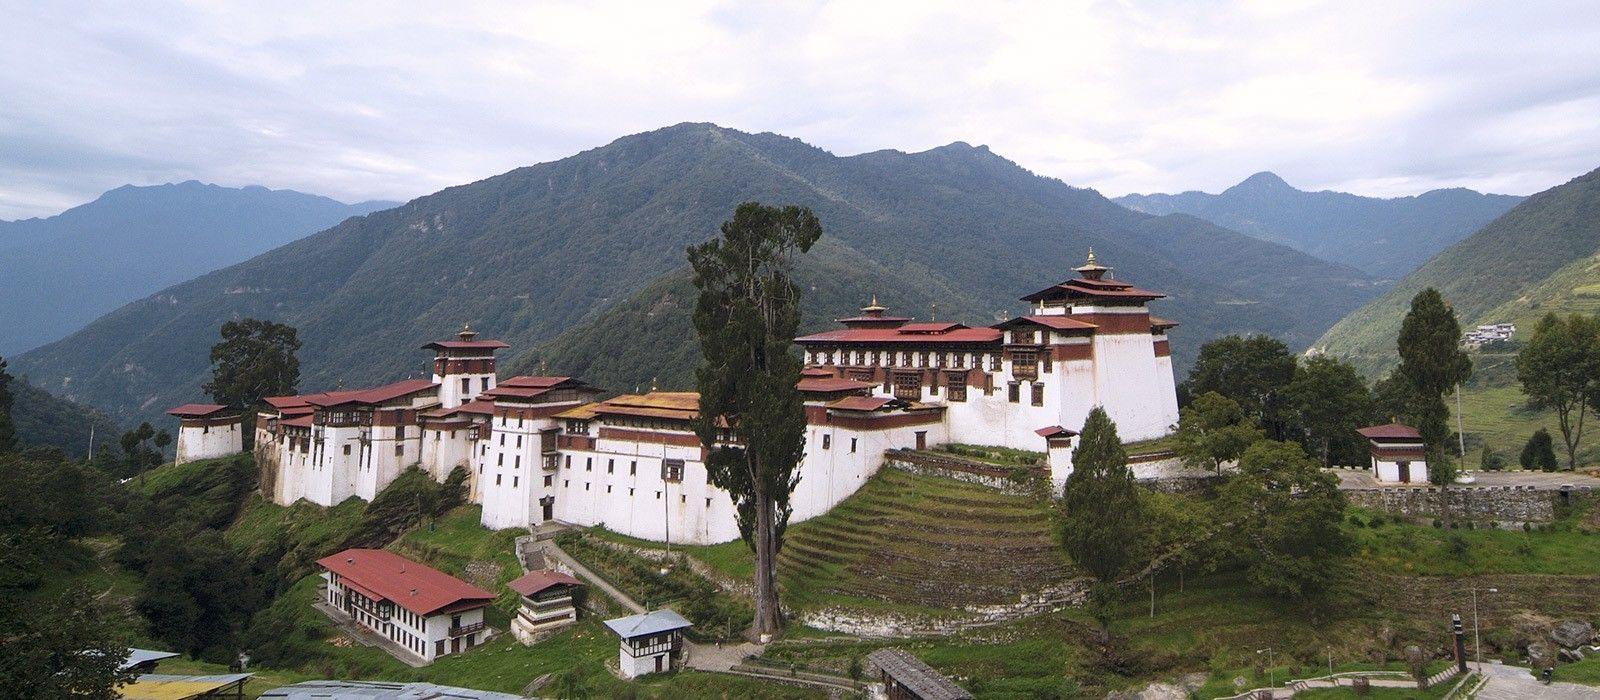 Reiseziel Trongsa Bhutan